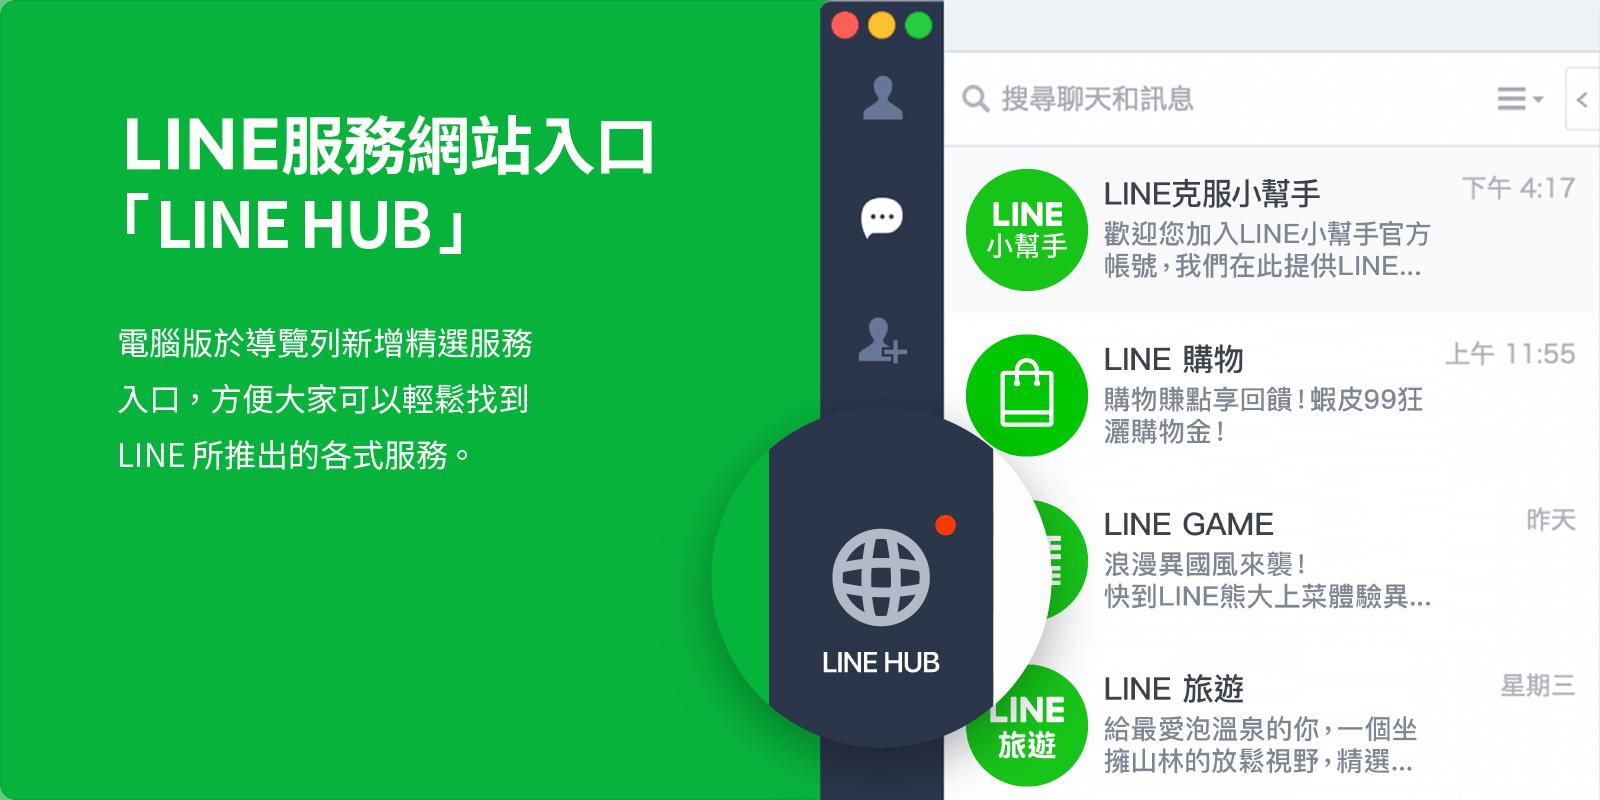 LINE HUB新型態入口網站-電腦版的LINE TODAY-用電腦追劇跟購物更EASY